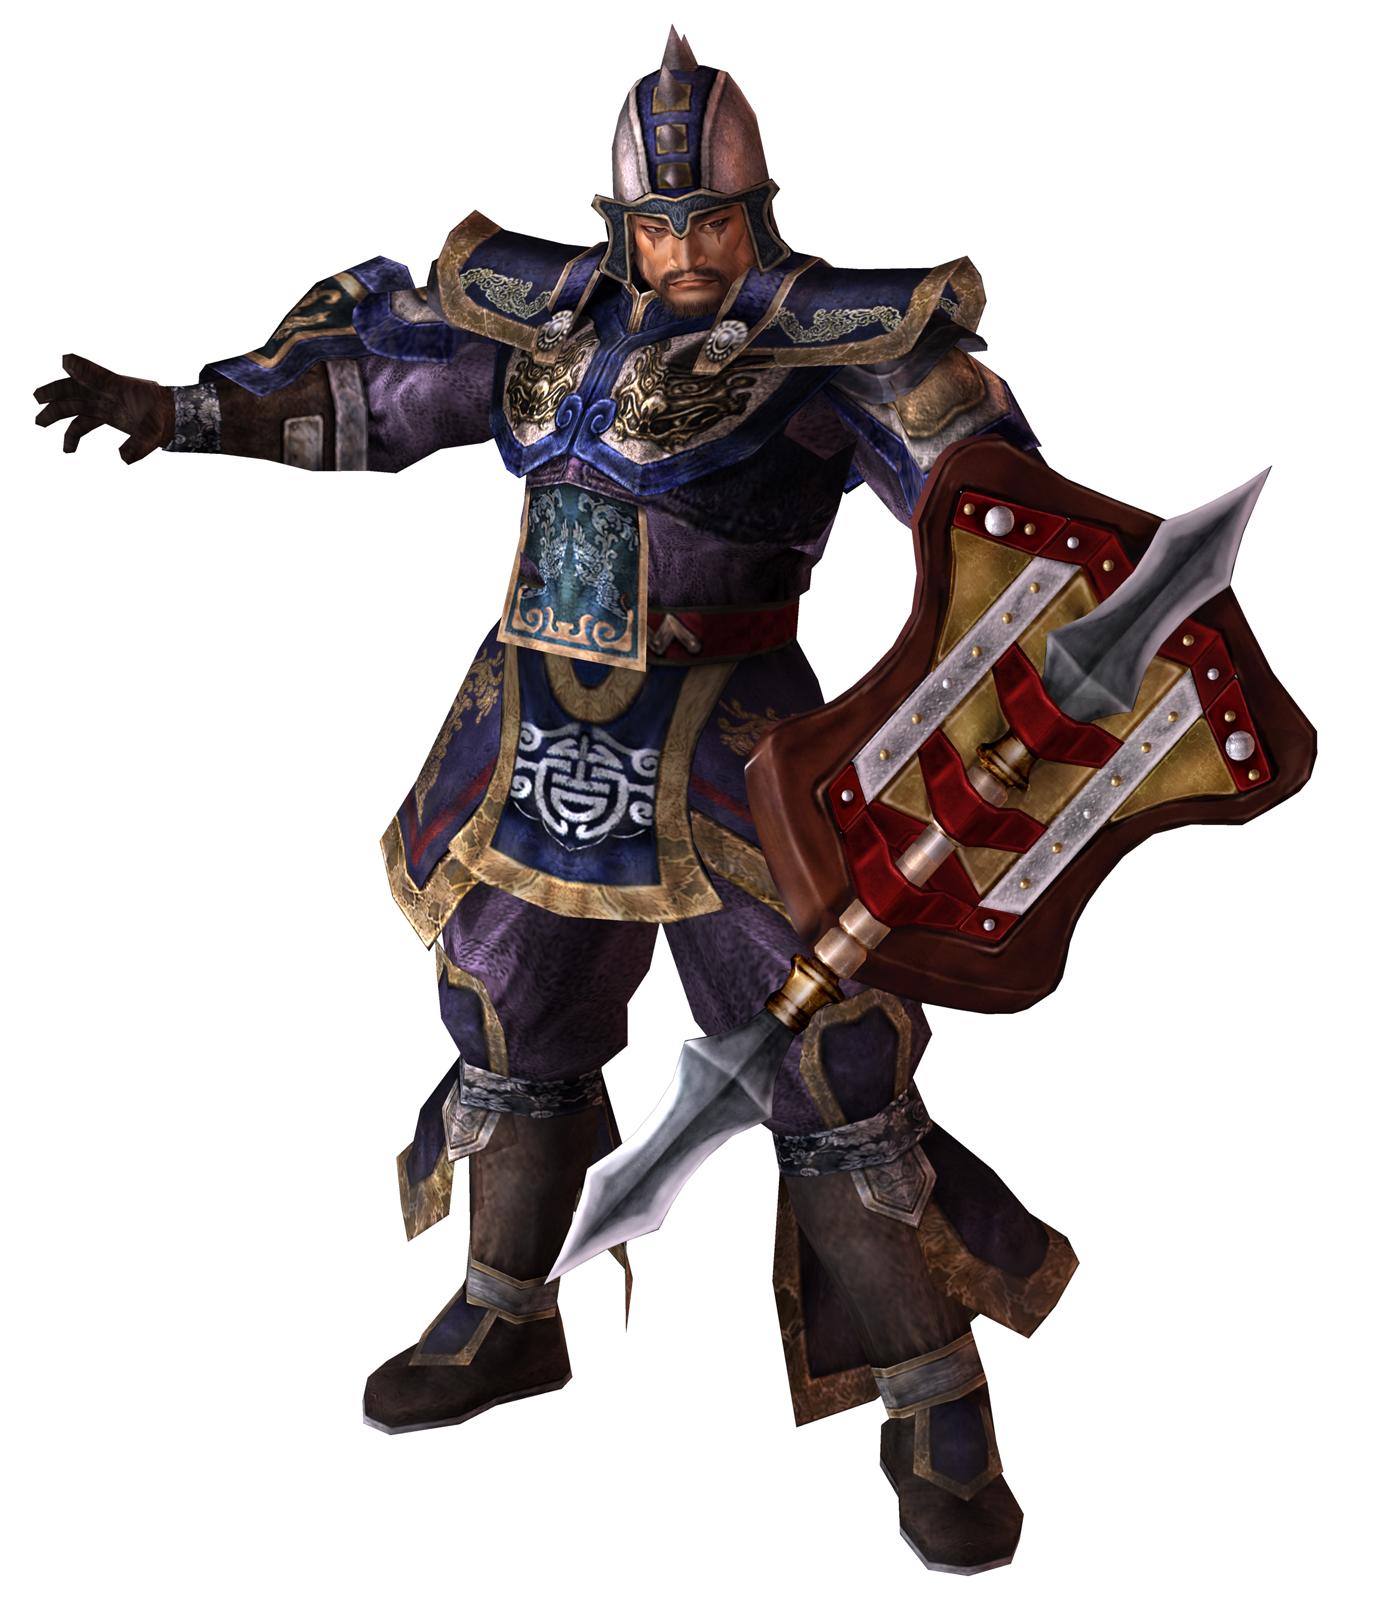 Caopi-dw8art |Cao Cao Dynasty Warriors 8